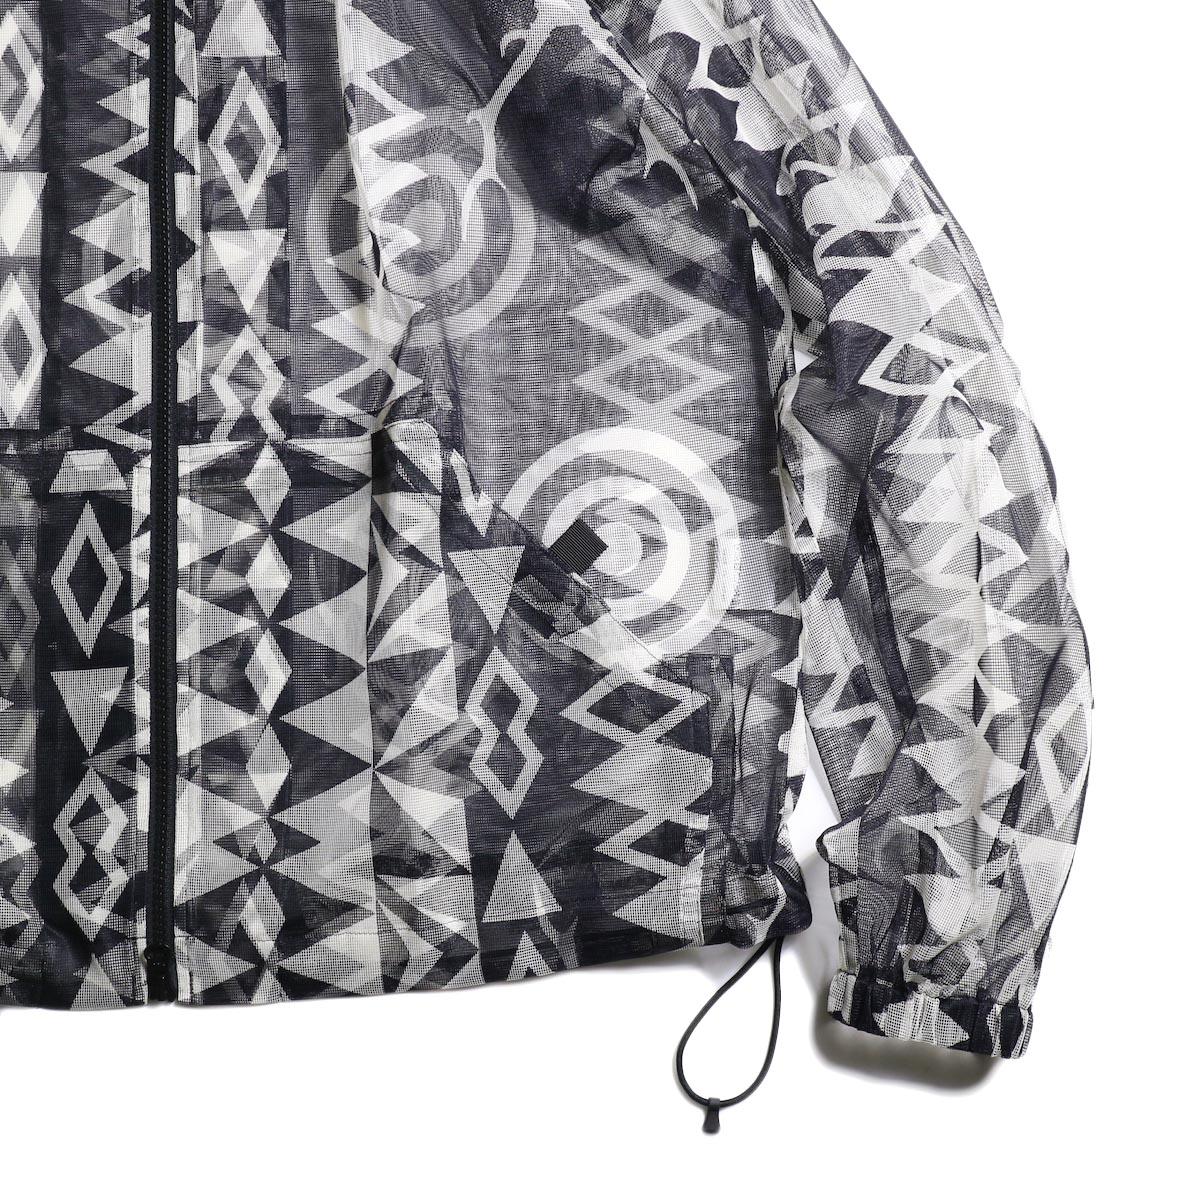 South2 West8 / Bush Parka - Poly Lightweight Mesh / Print (Skull&Target)袖、裾